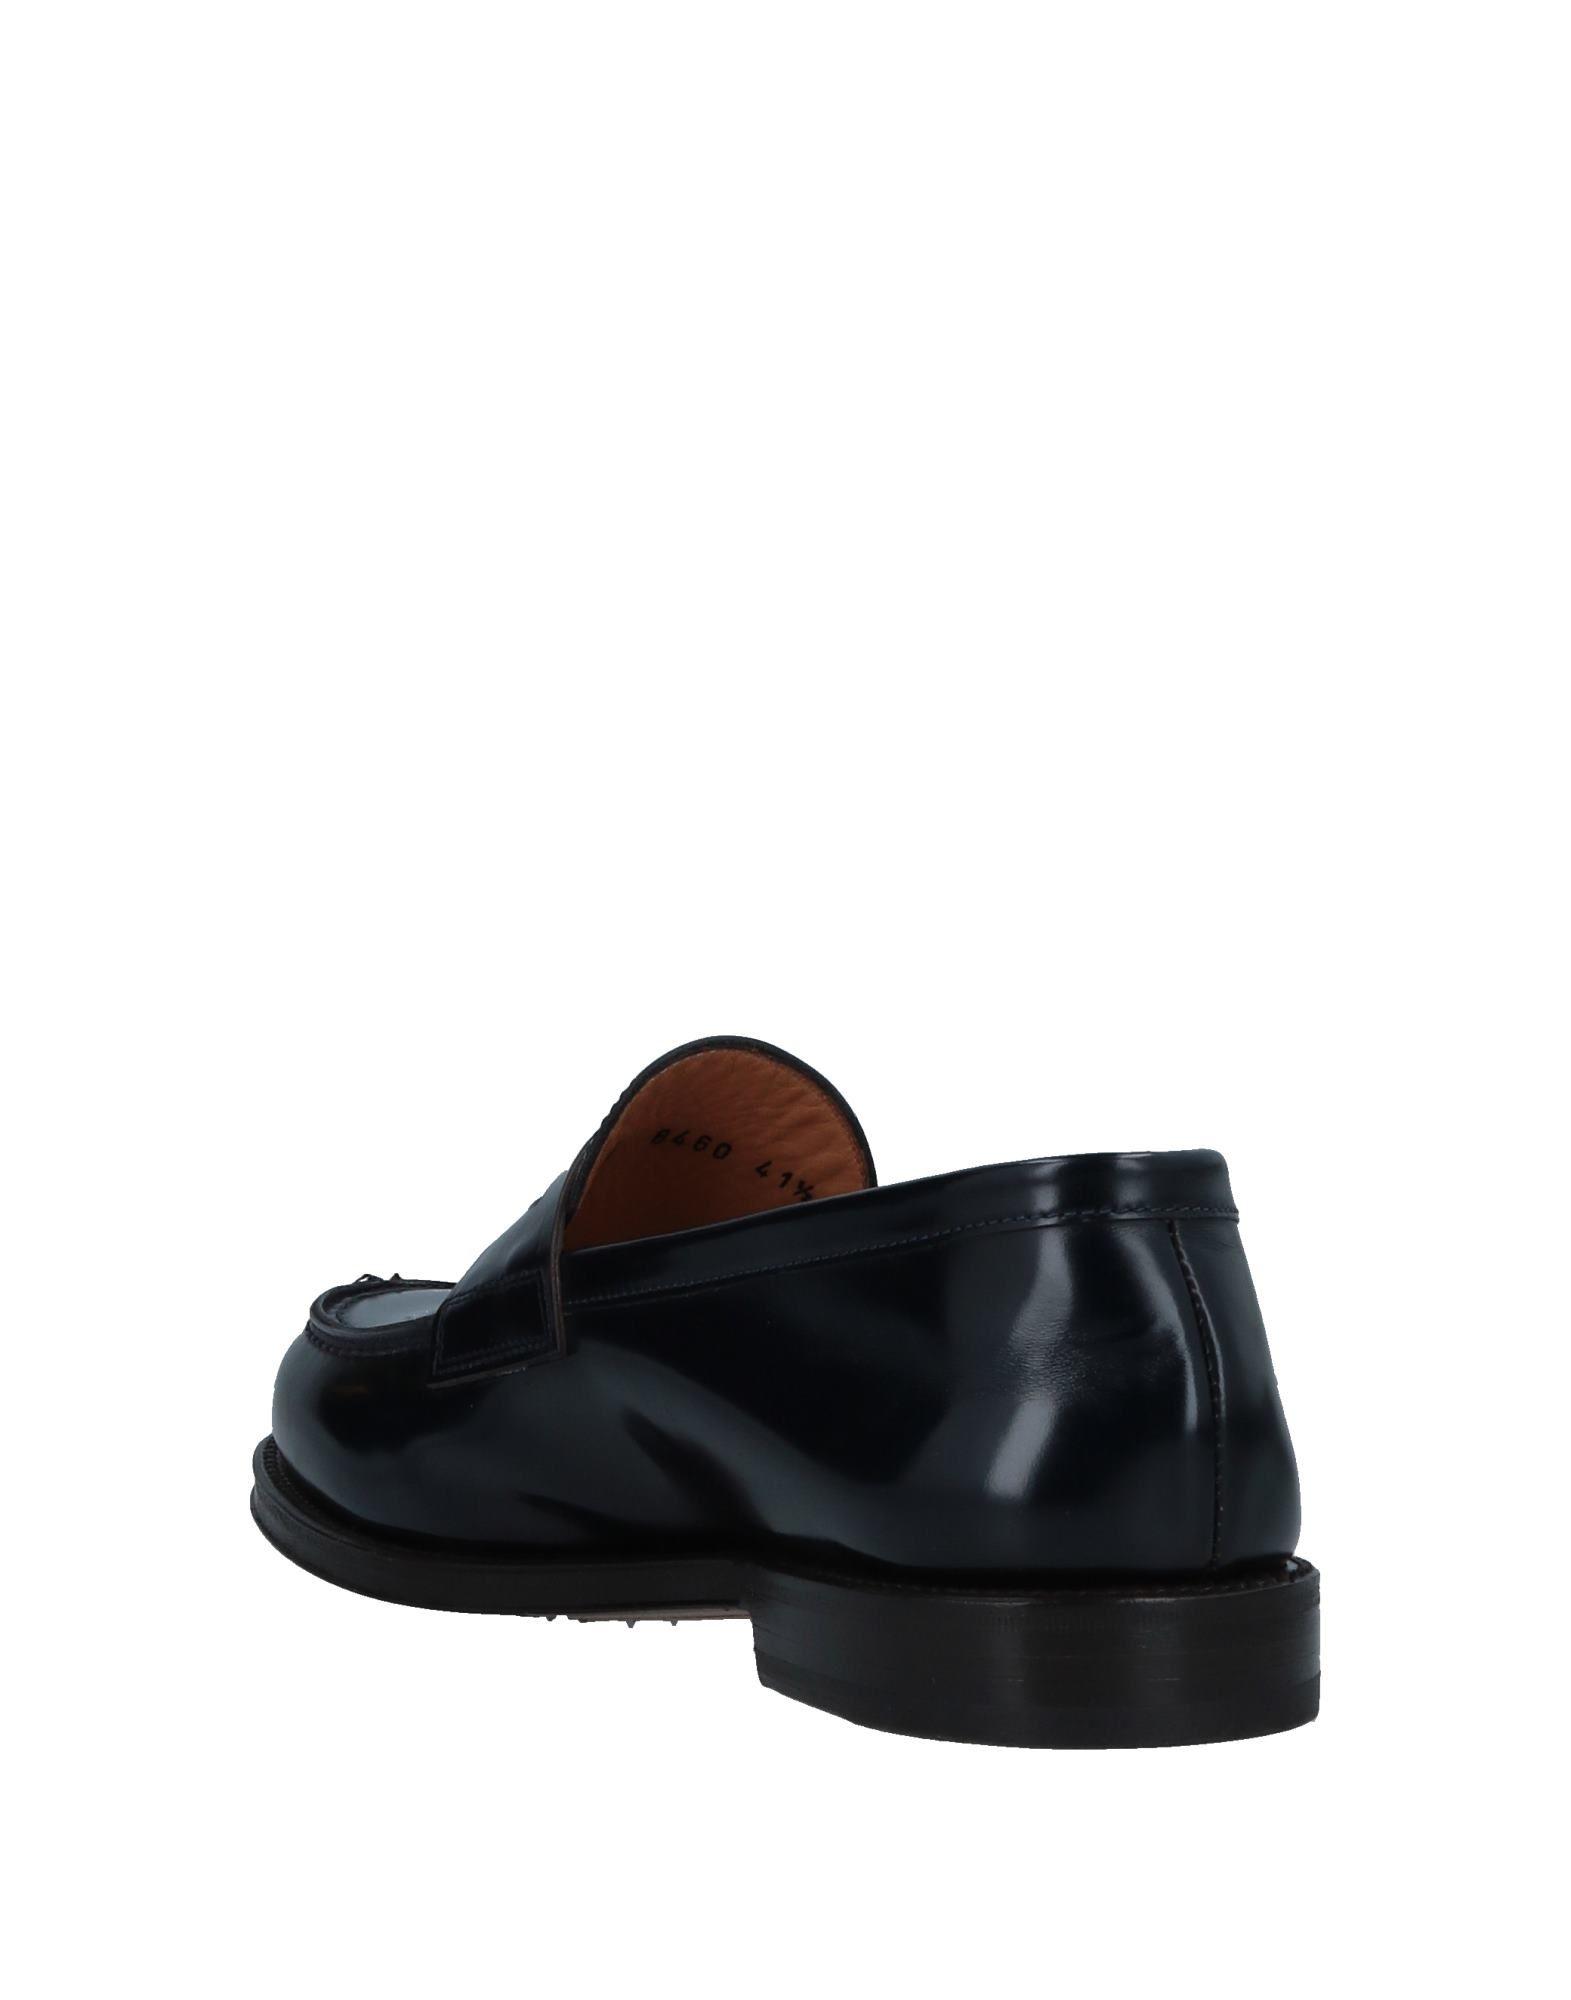 Fabi Mokassins Mokassins Mokassins Herren  11415889PK Heiße Schuhe 084fb2